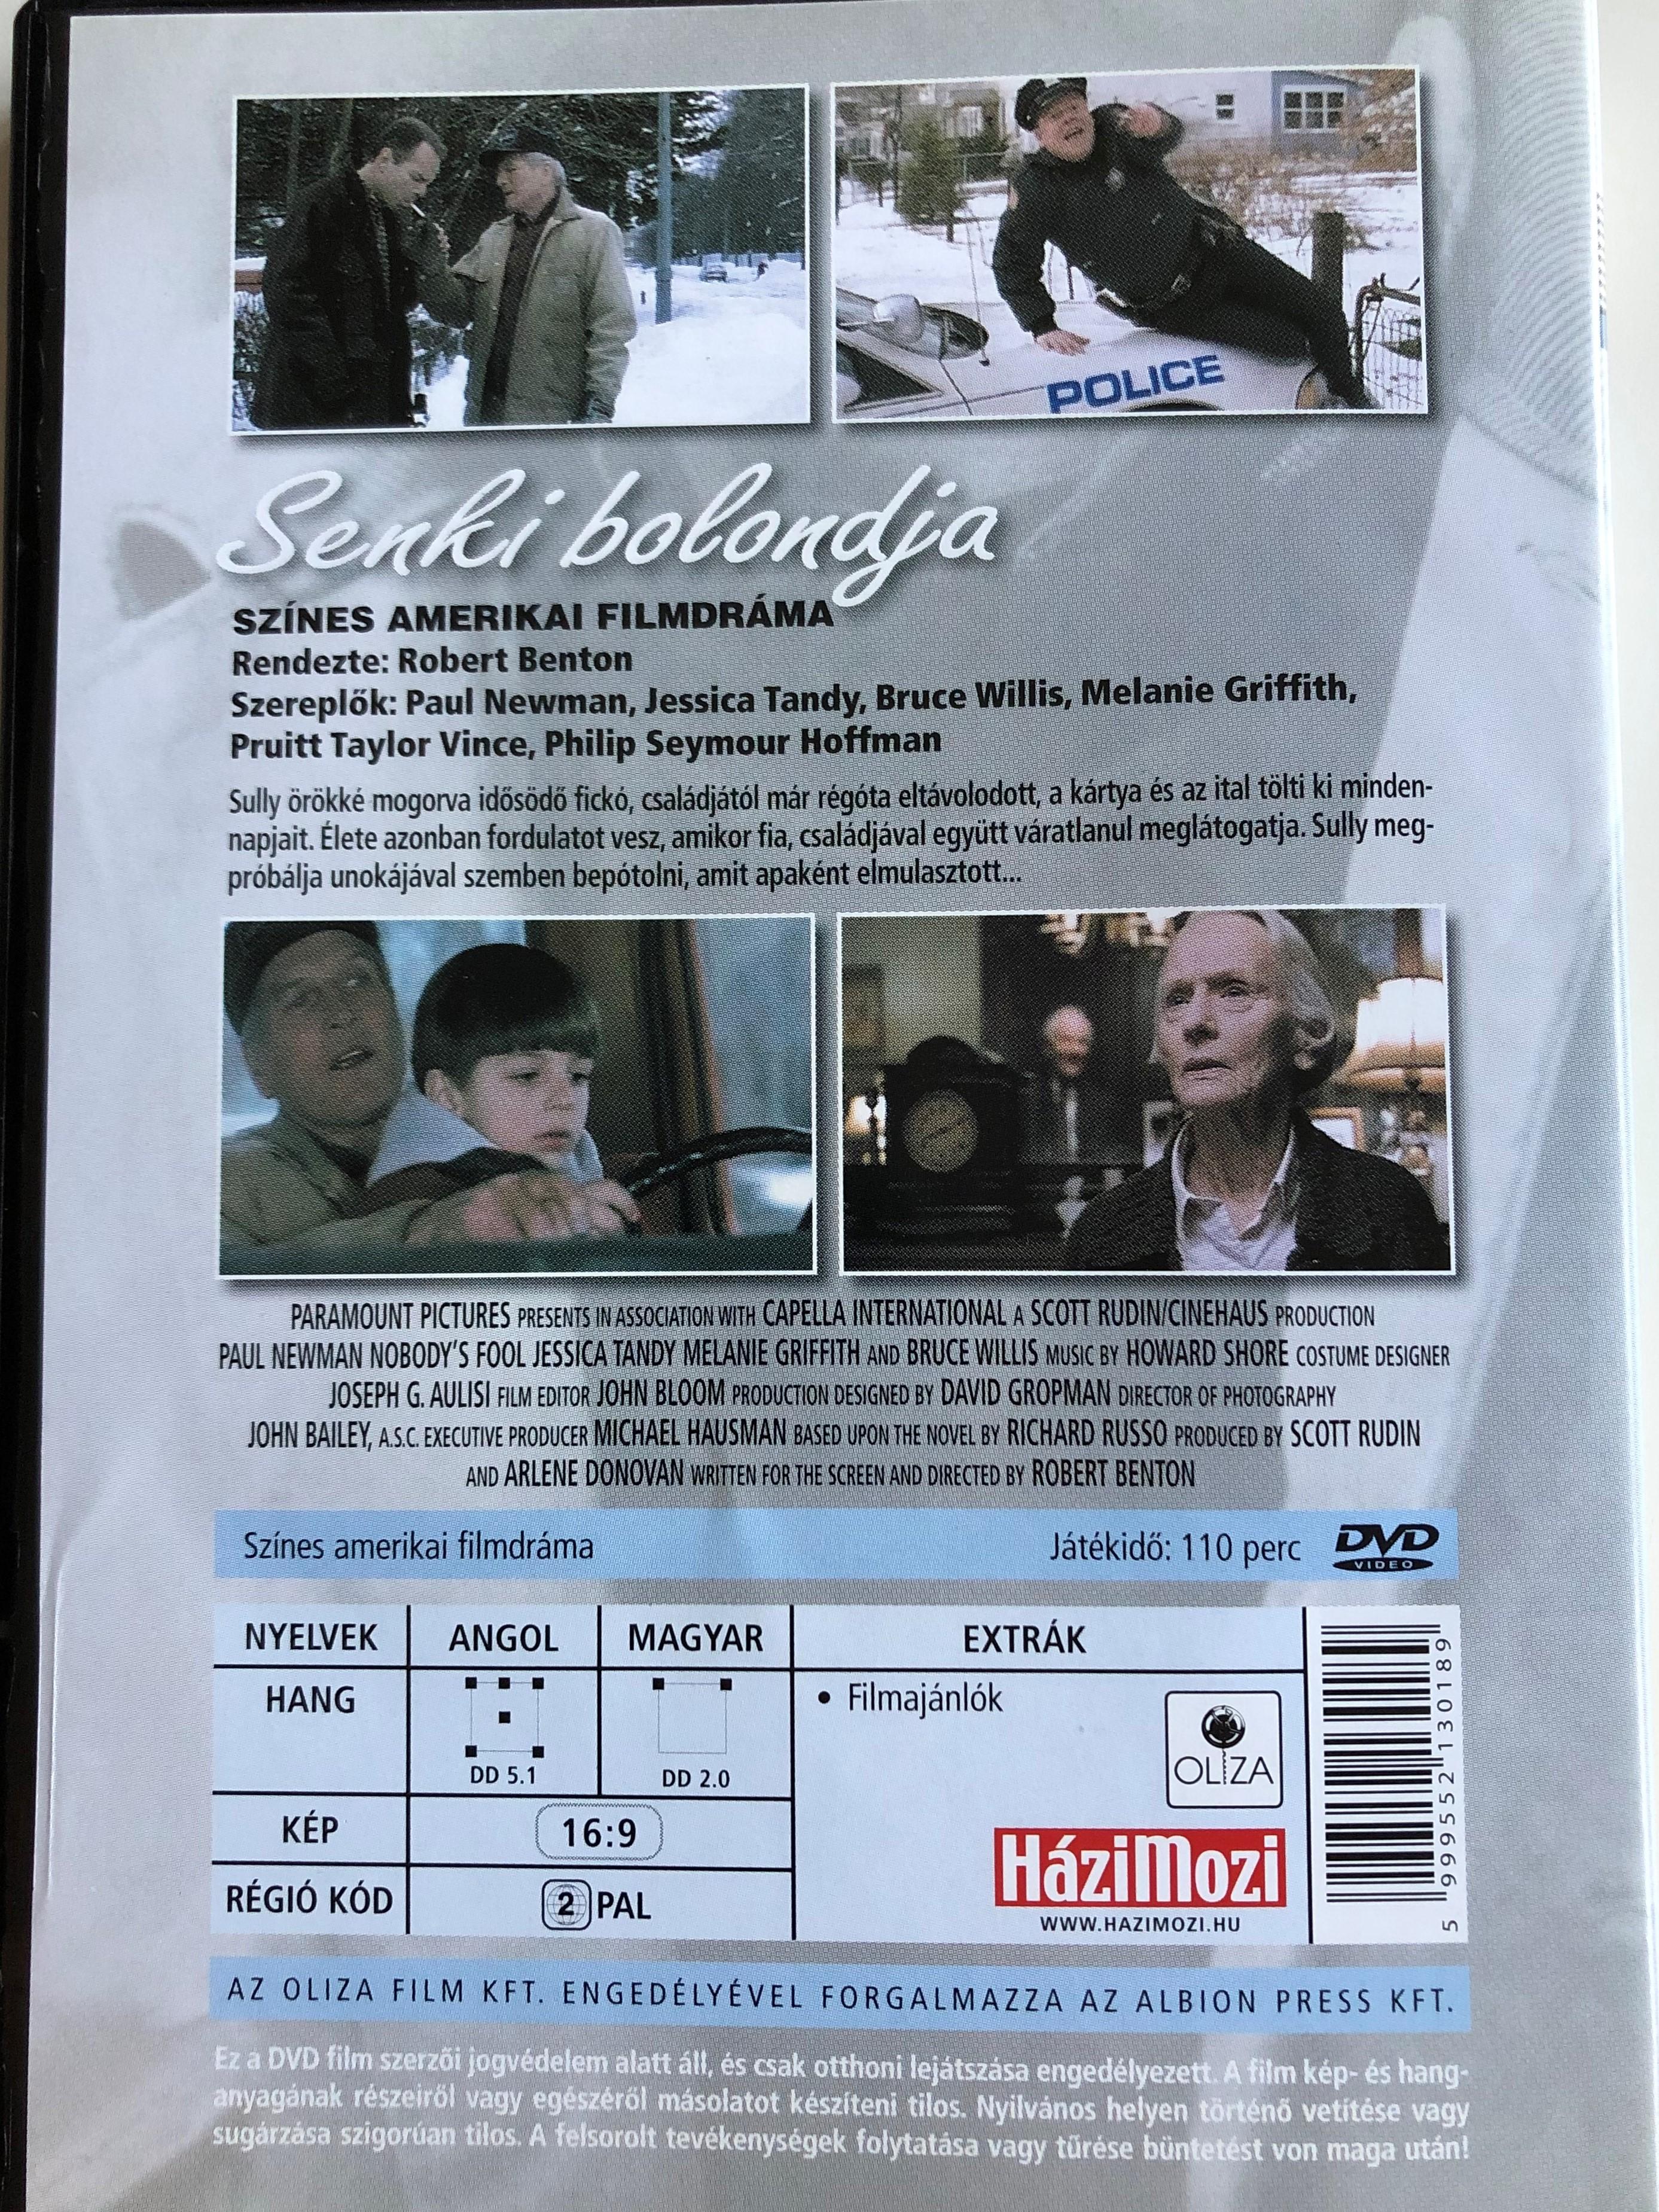 nobody-s-fool-dvd-1994-senki-bolondja-directed-by-robert-benton-starring-paul-newman-paul-newman-jessica-tandy-bruce-willis-melanie-griffith-2-.jpg